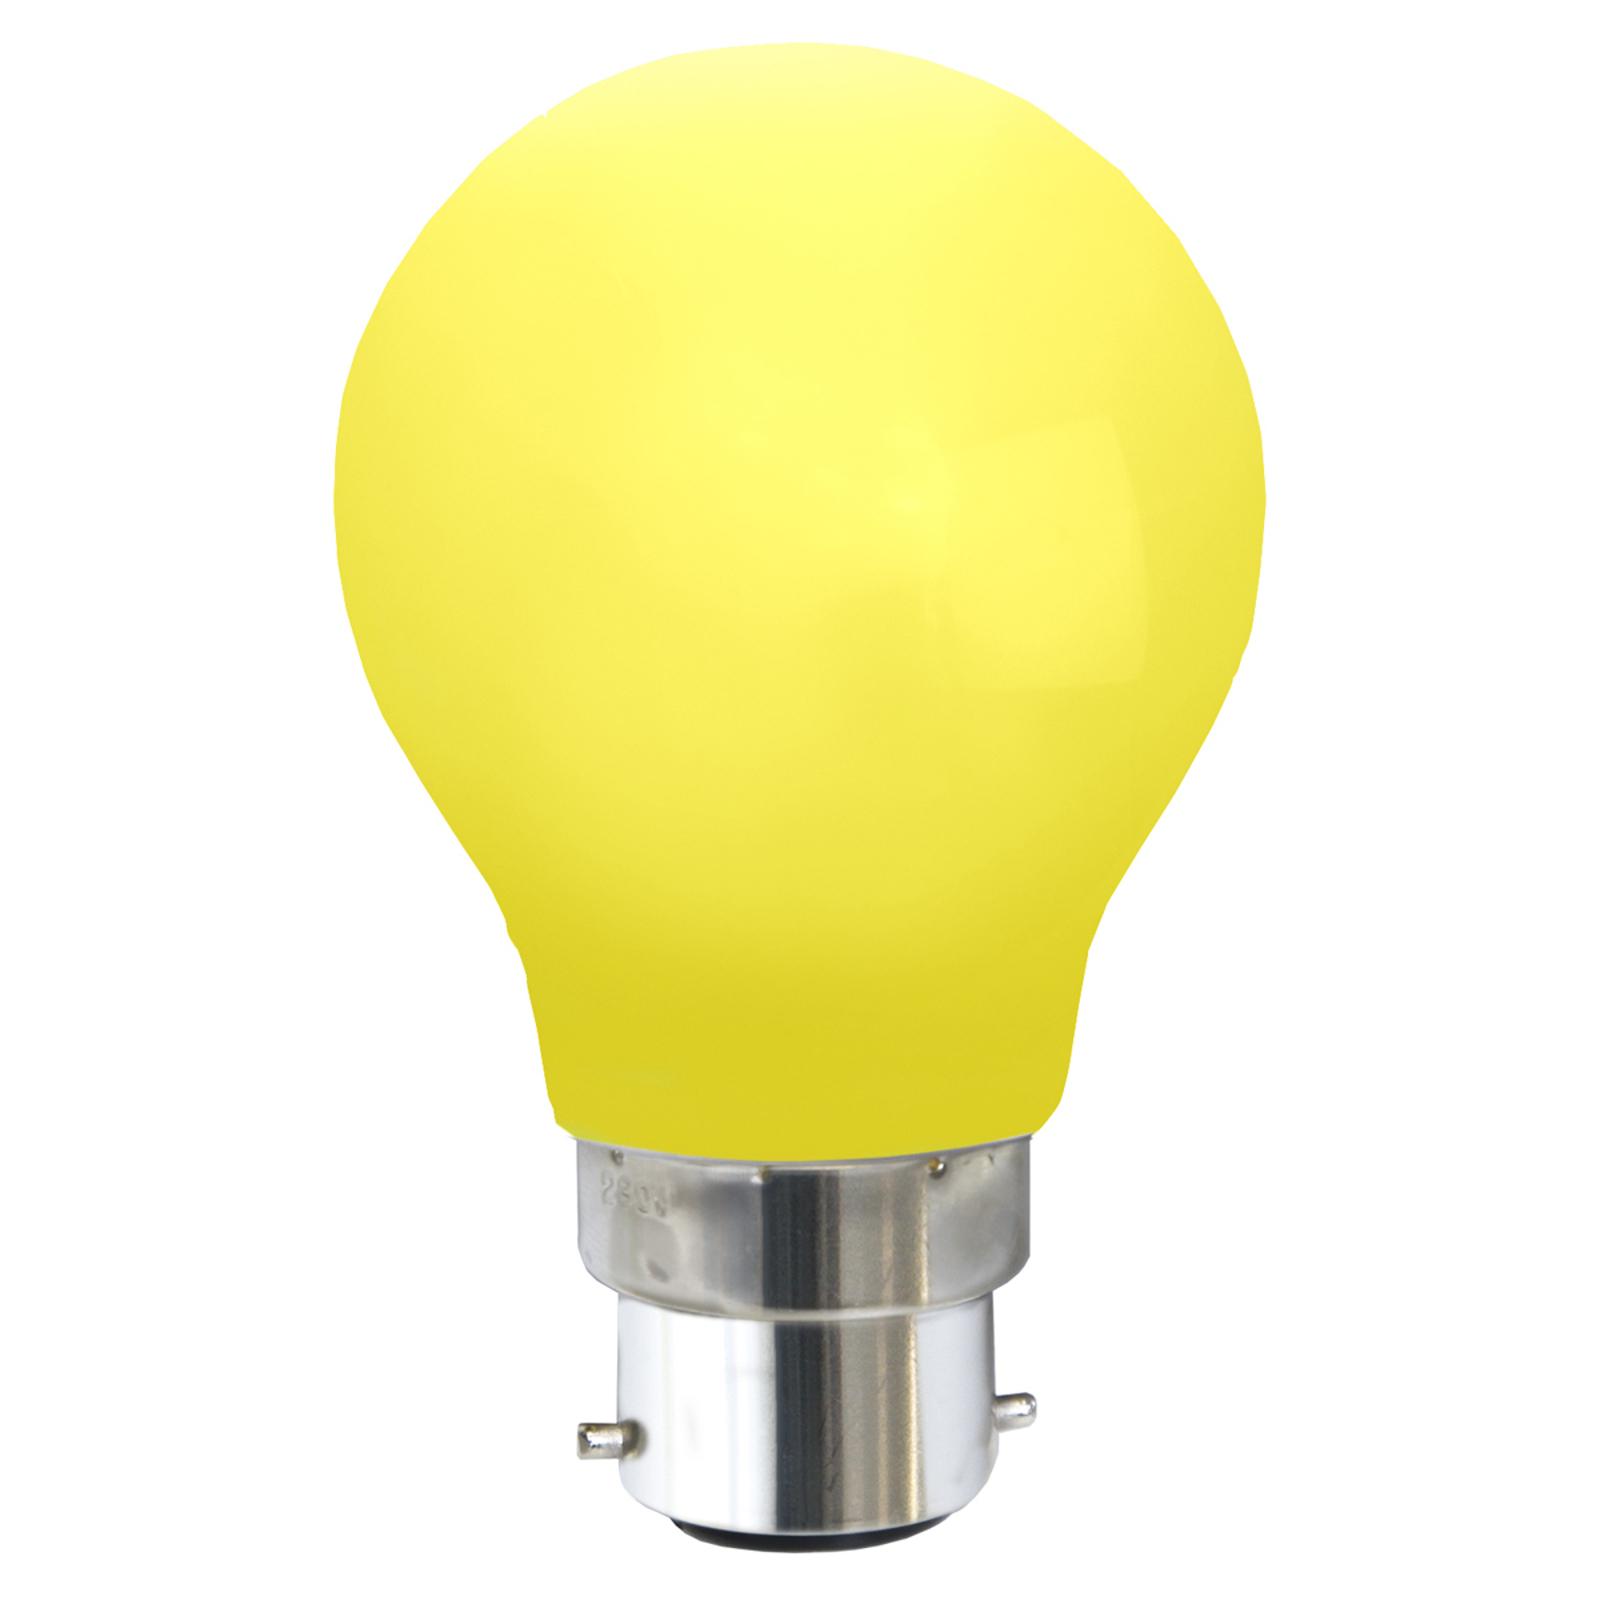 Ampoule LED B22 0,8W, jaune